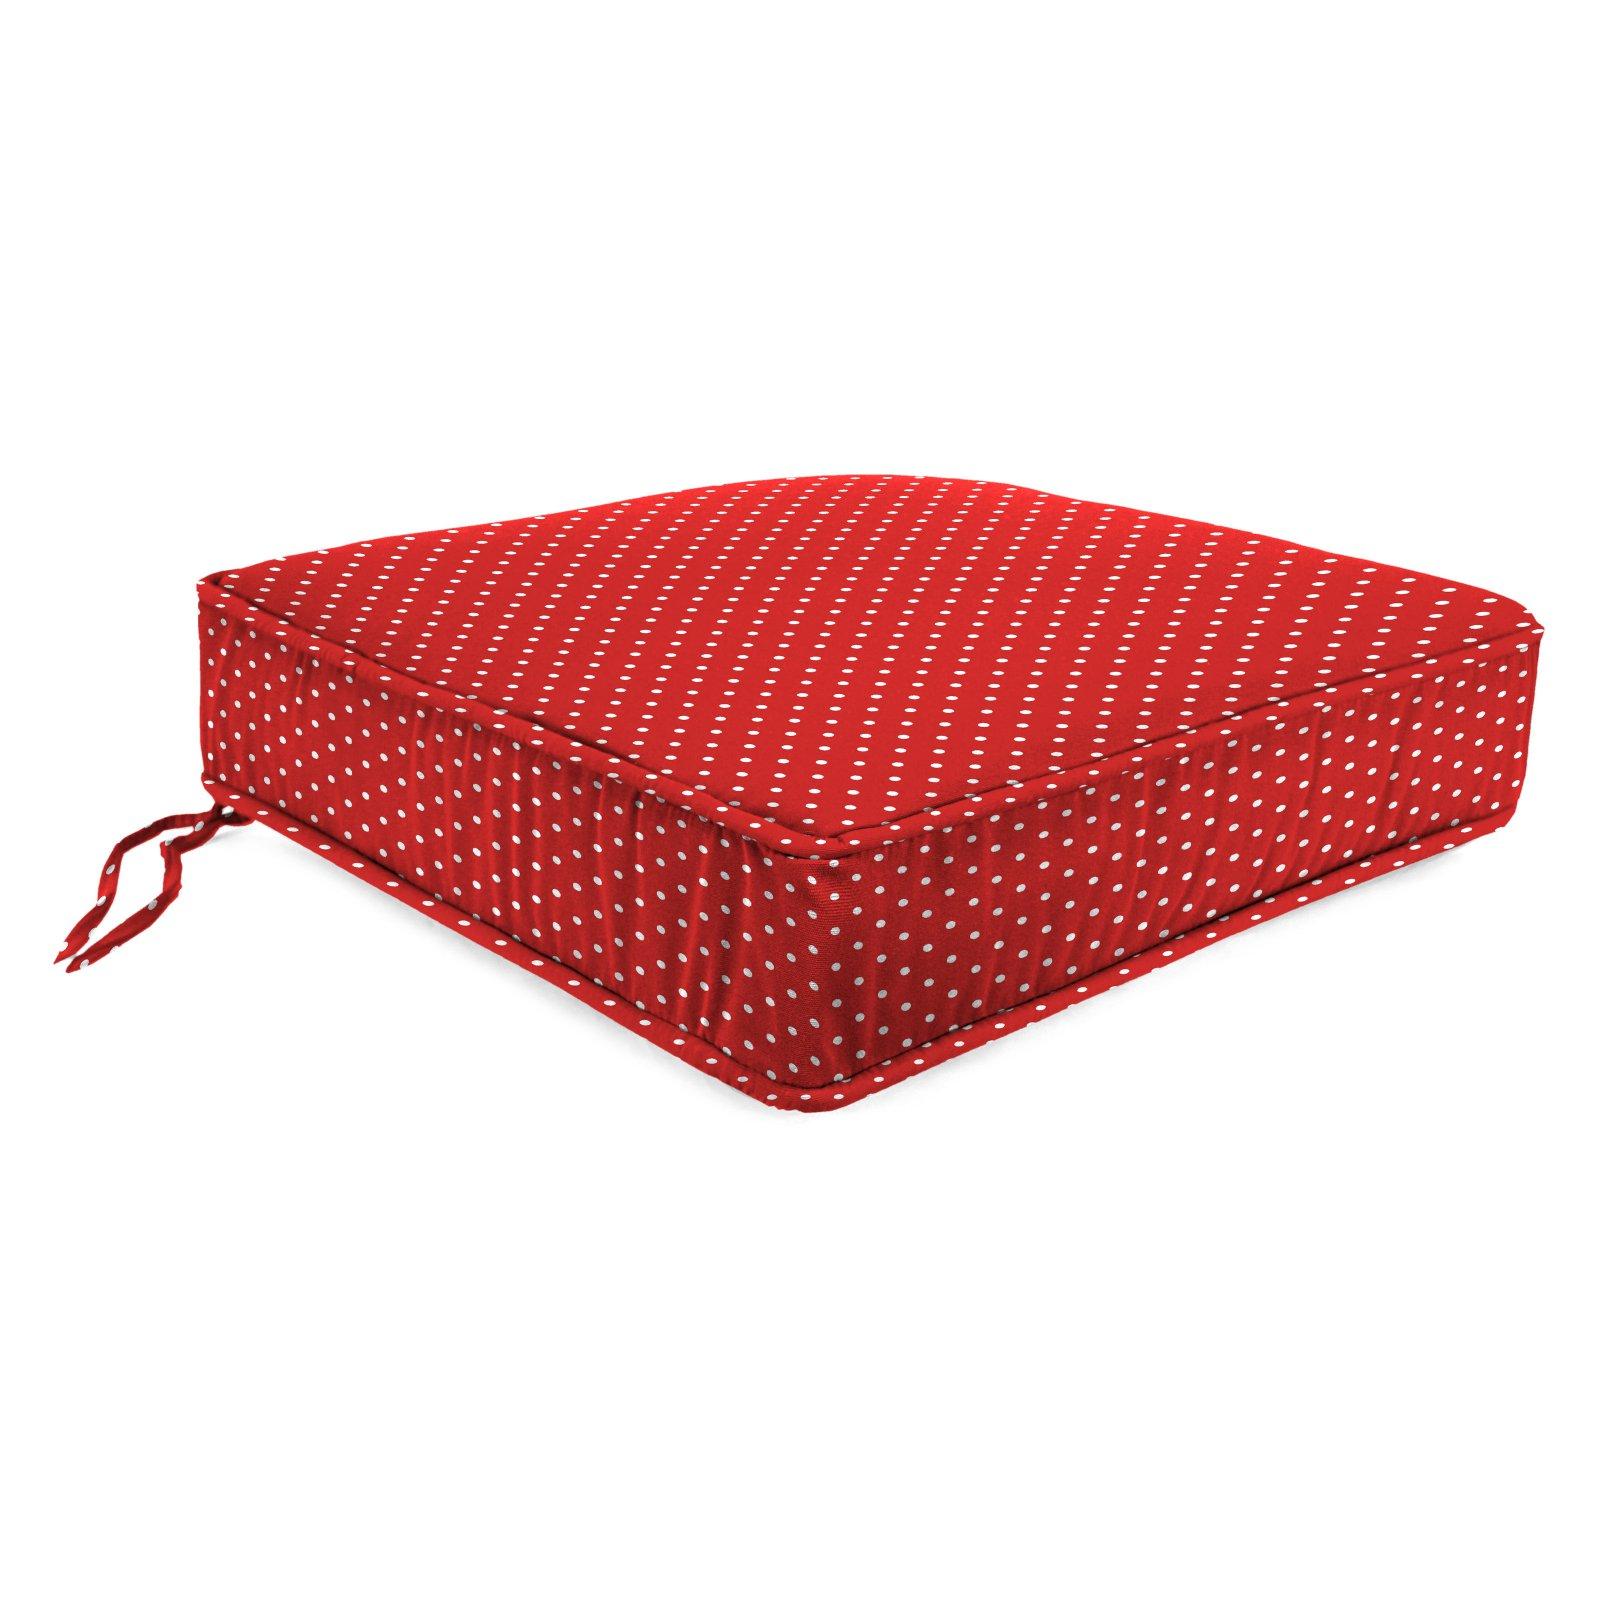 Jordan Manufacturing Reversible Outdoor Tufted Wicker Settee/Loveseat Cushion, Multiple Patterns